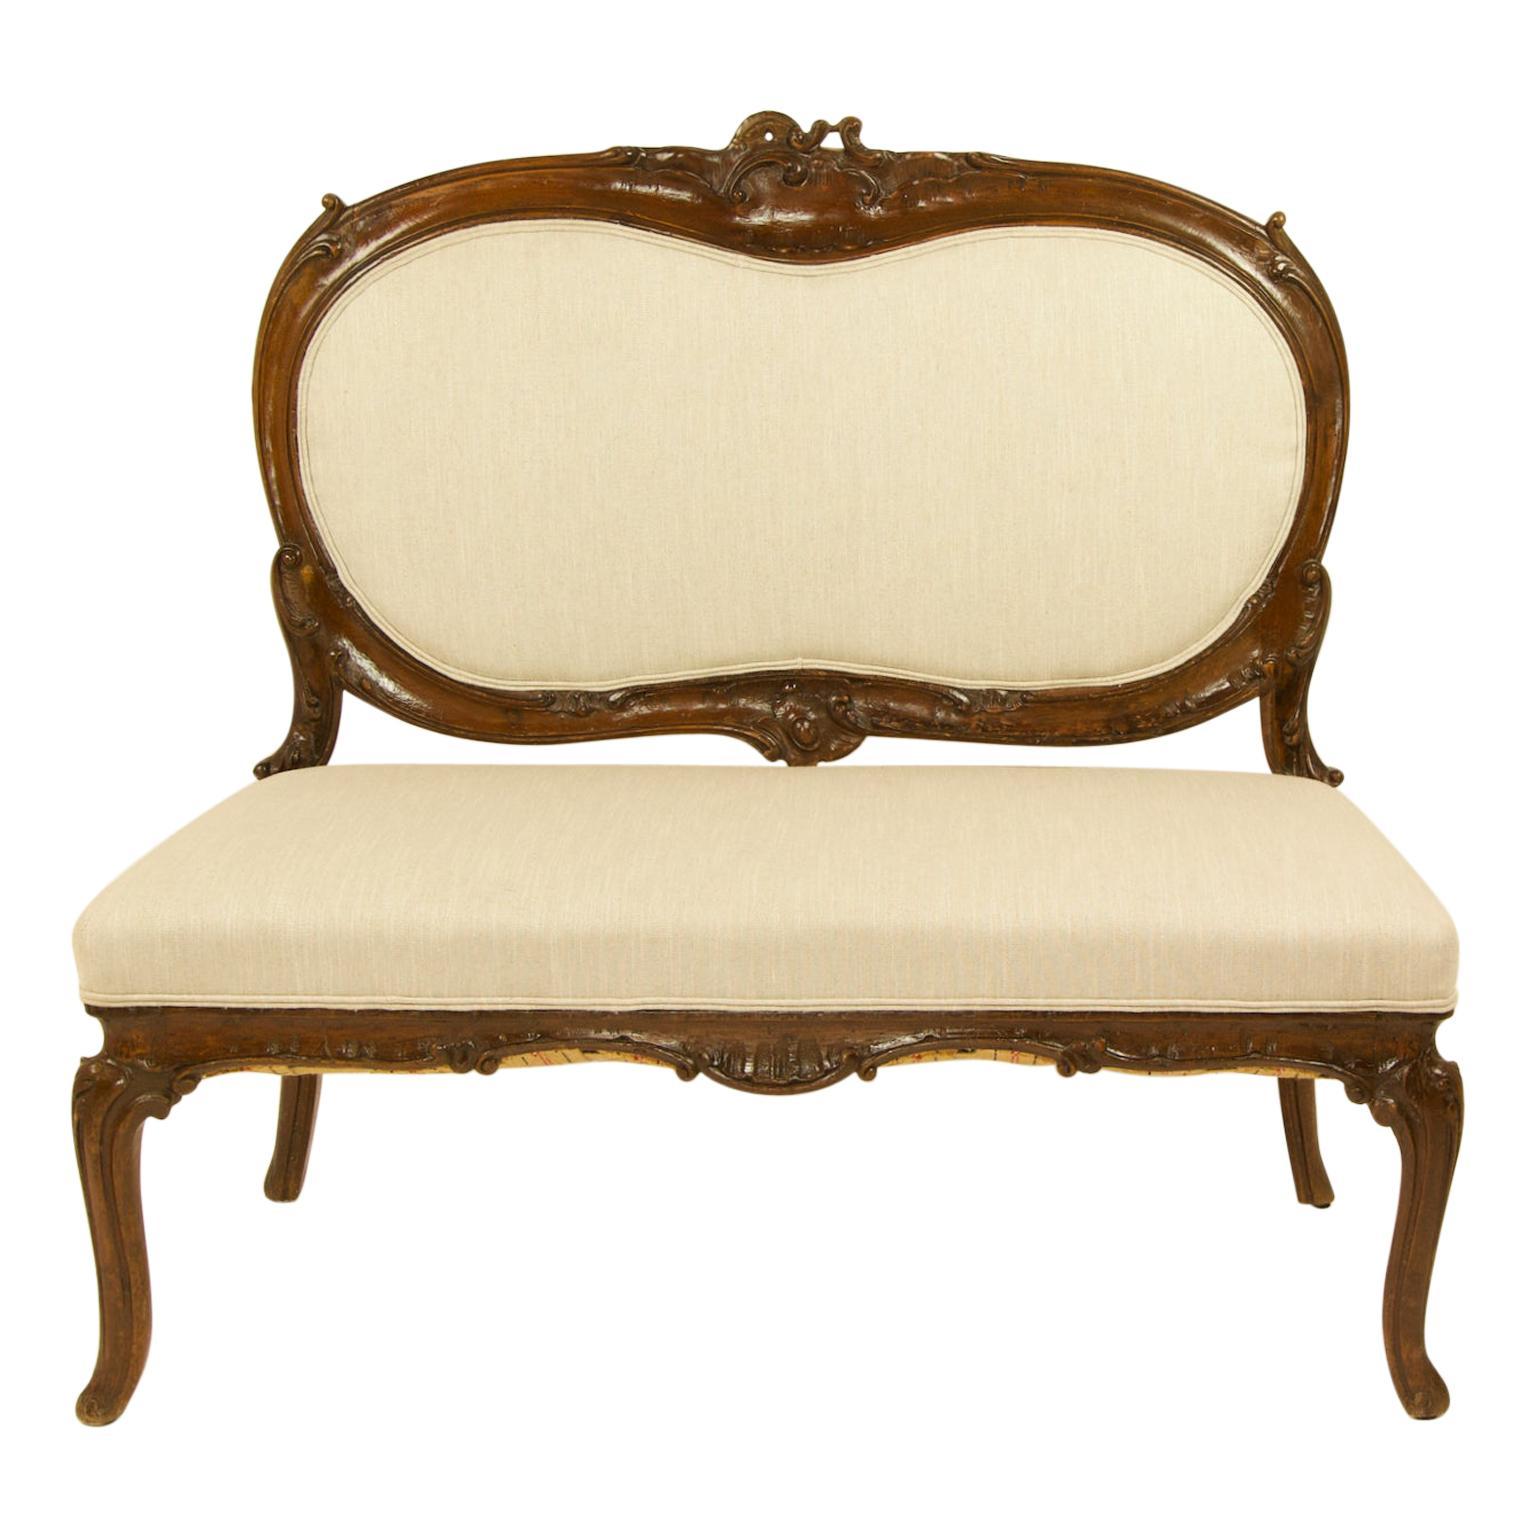 Italian 18th Century Rococo Carved Walnut Sofa or Canape